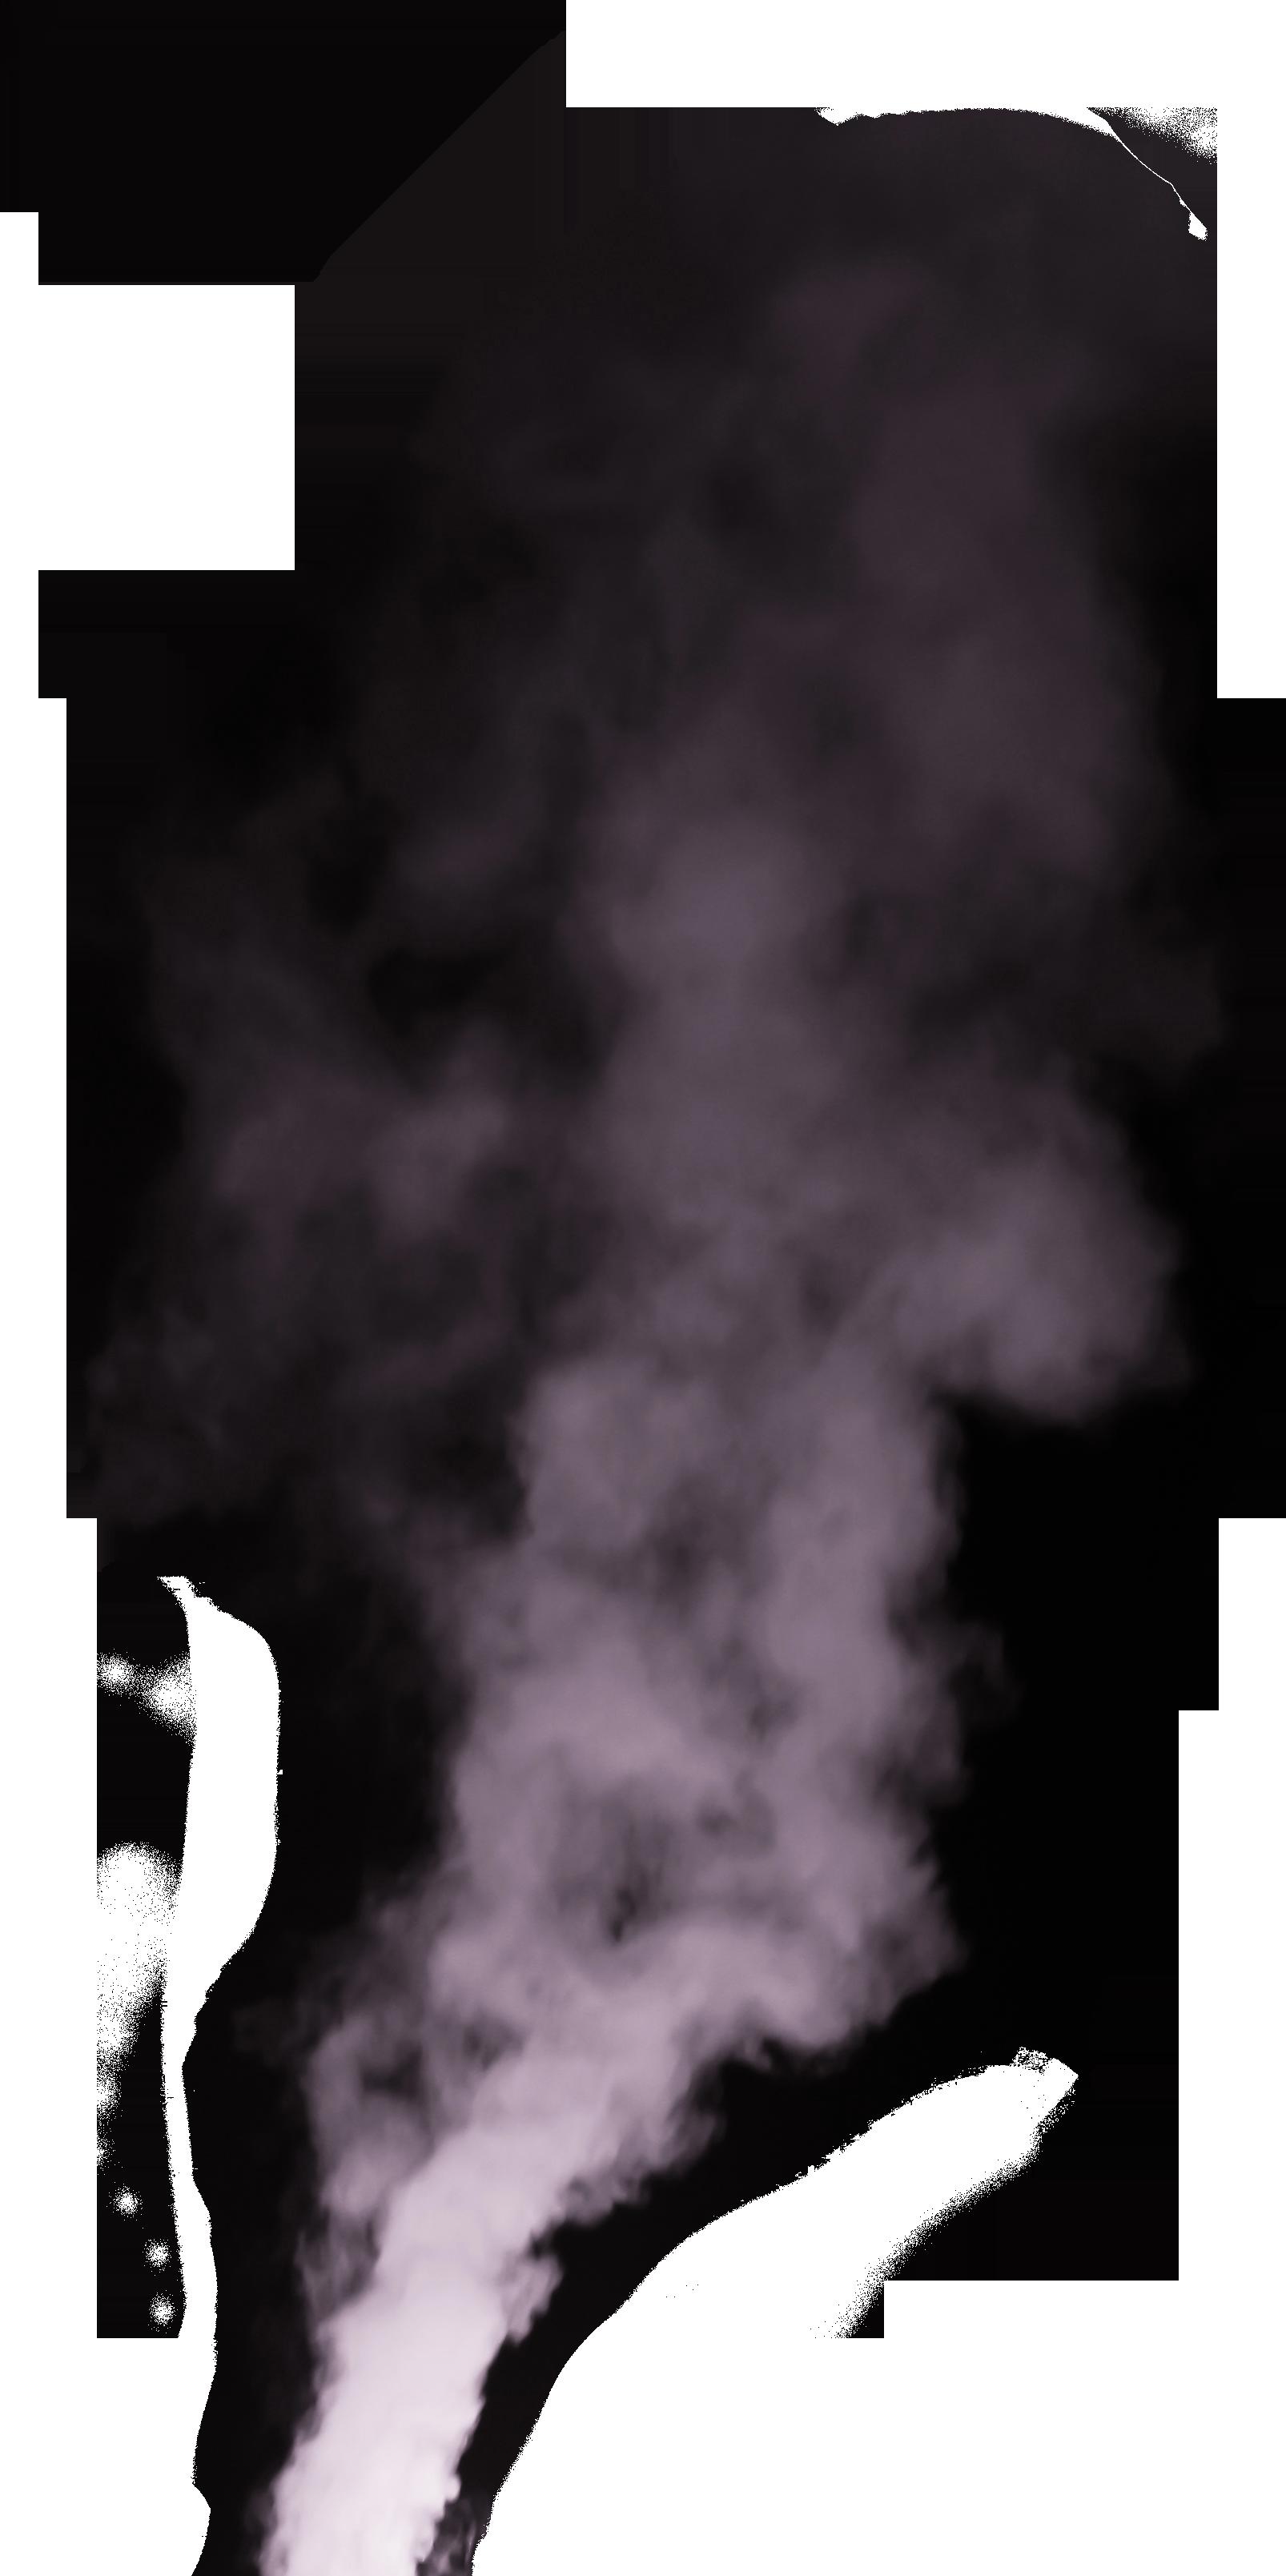 Chimney smoke png. White lavender fresh effect